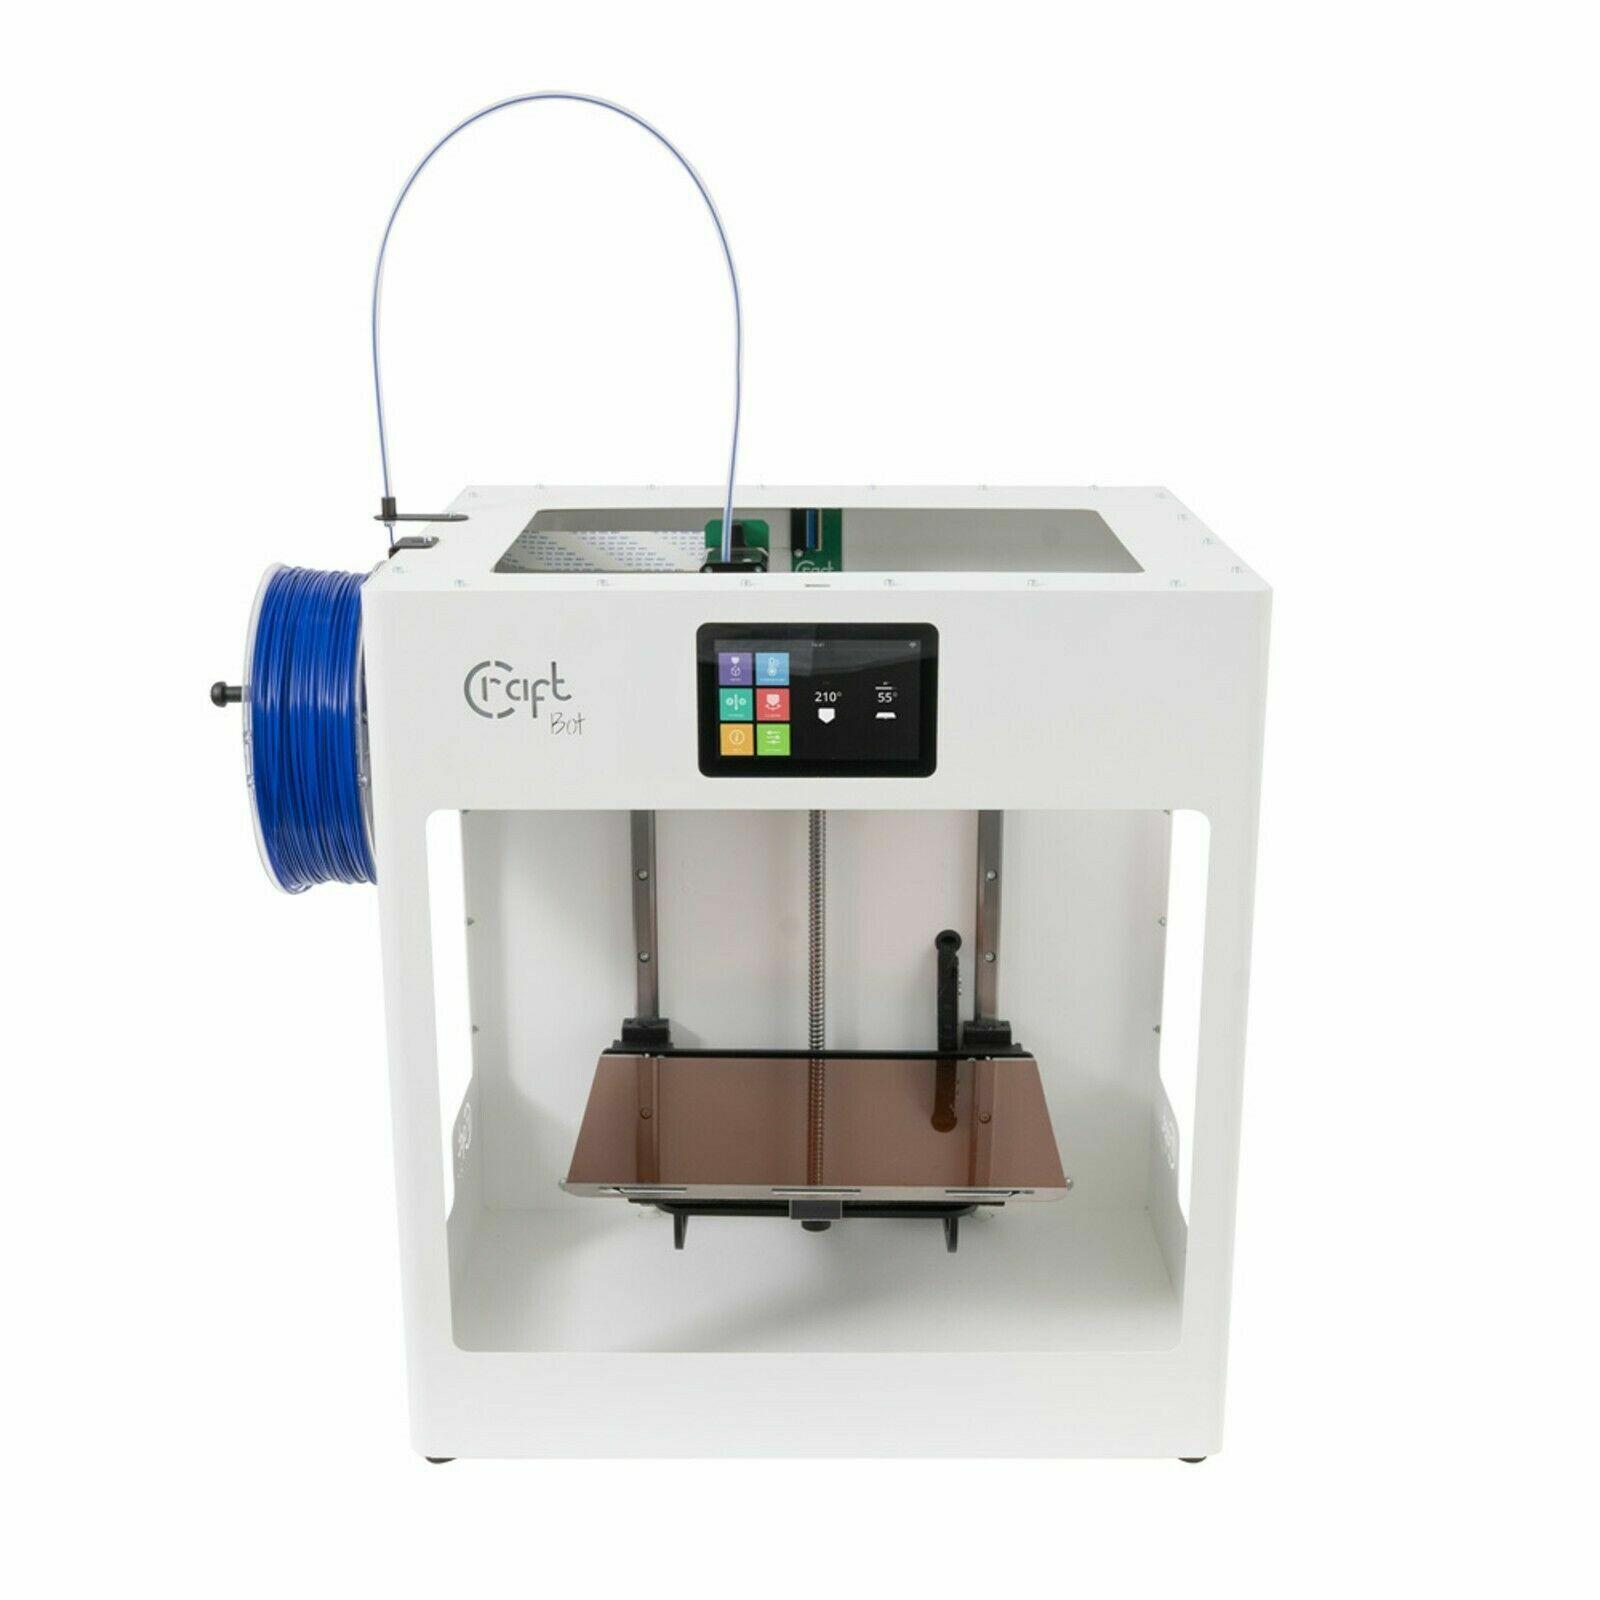 3D Printer craftunique craftbot Flow